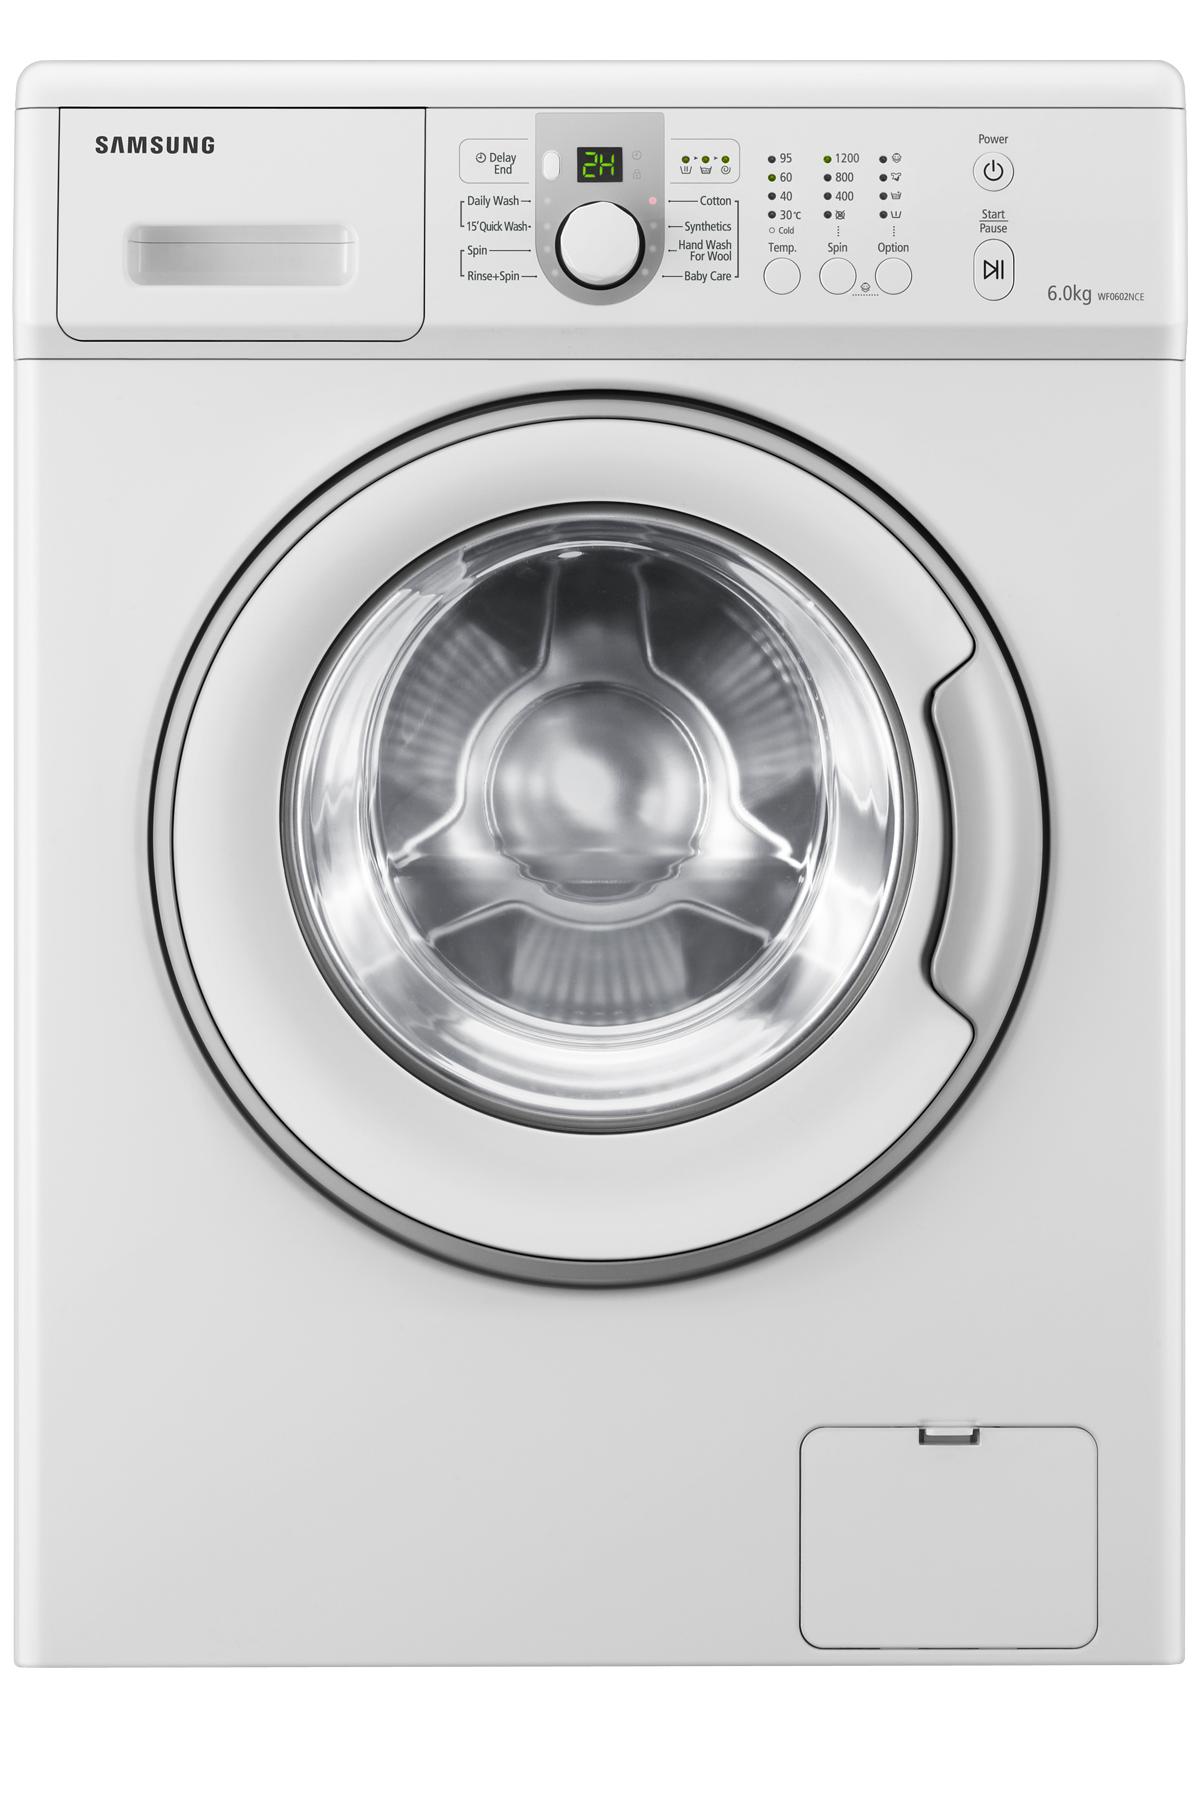 Aegis Bigbang Washer with Eco Bubble, 6 kg, White